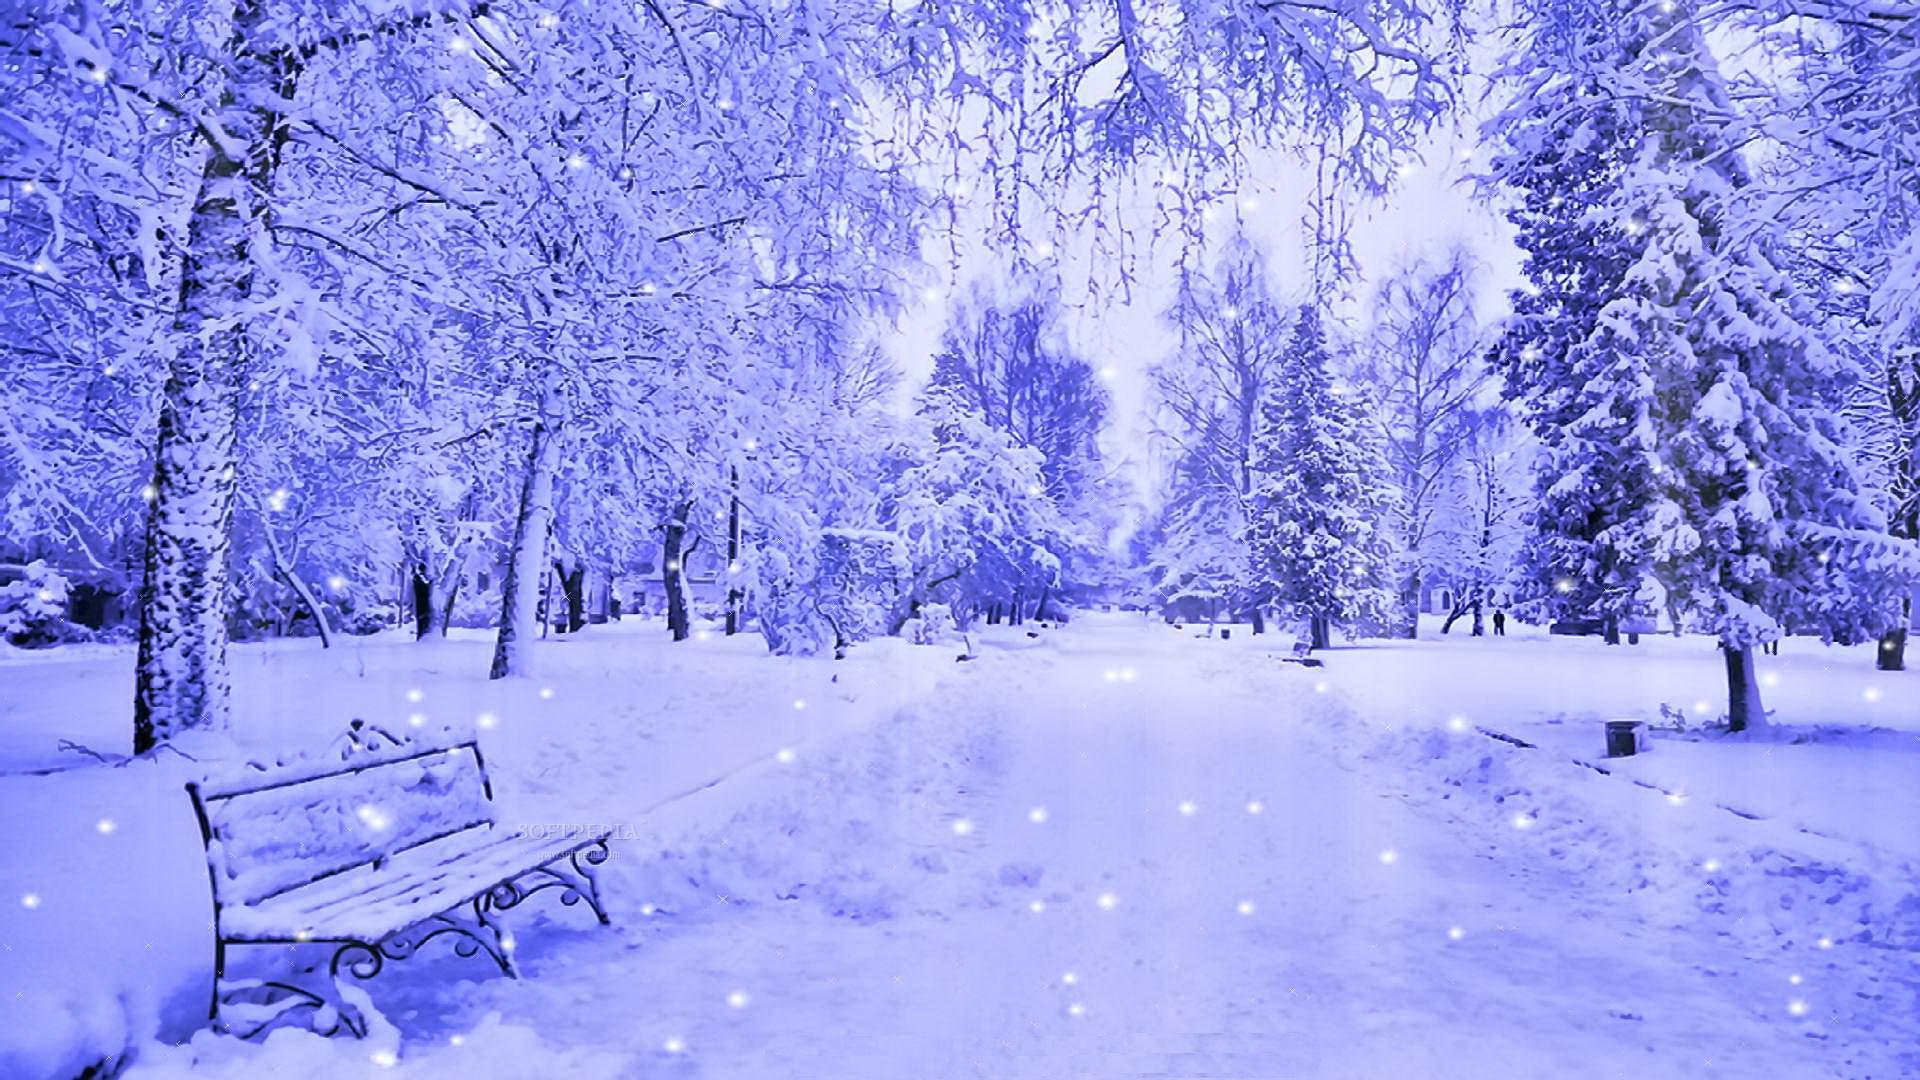 картинки как обои для телефона на экран зима